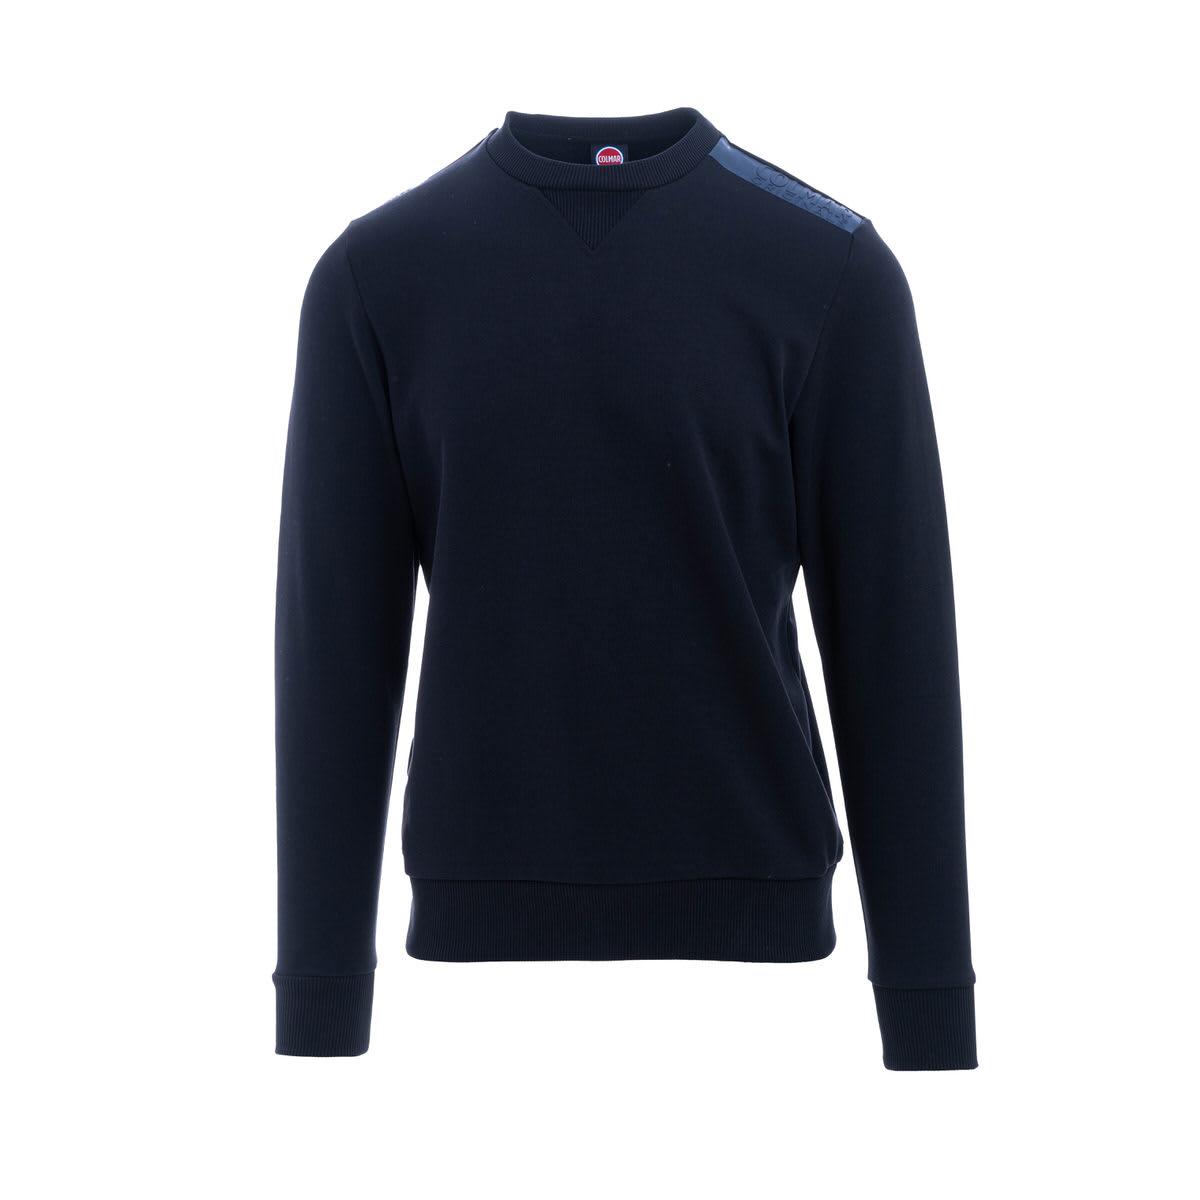 Colmar Sweatshirts ORIGINALS SWEATSHIRT